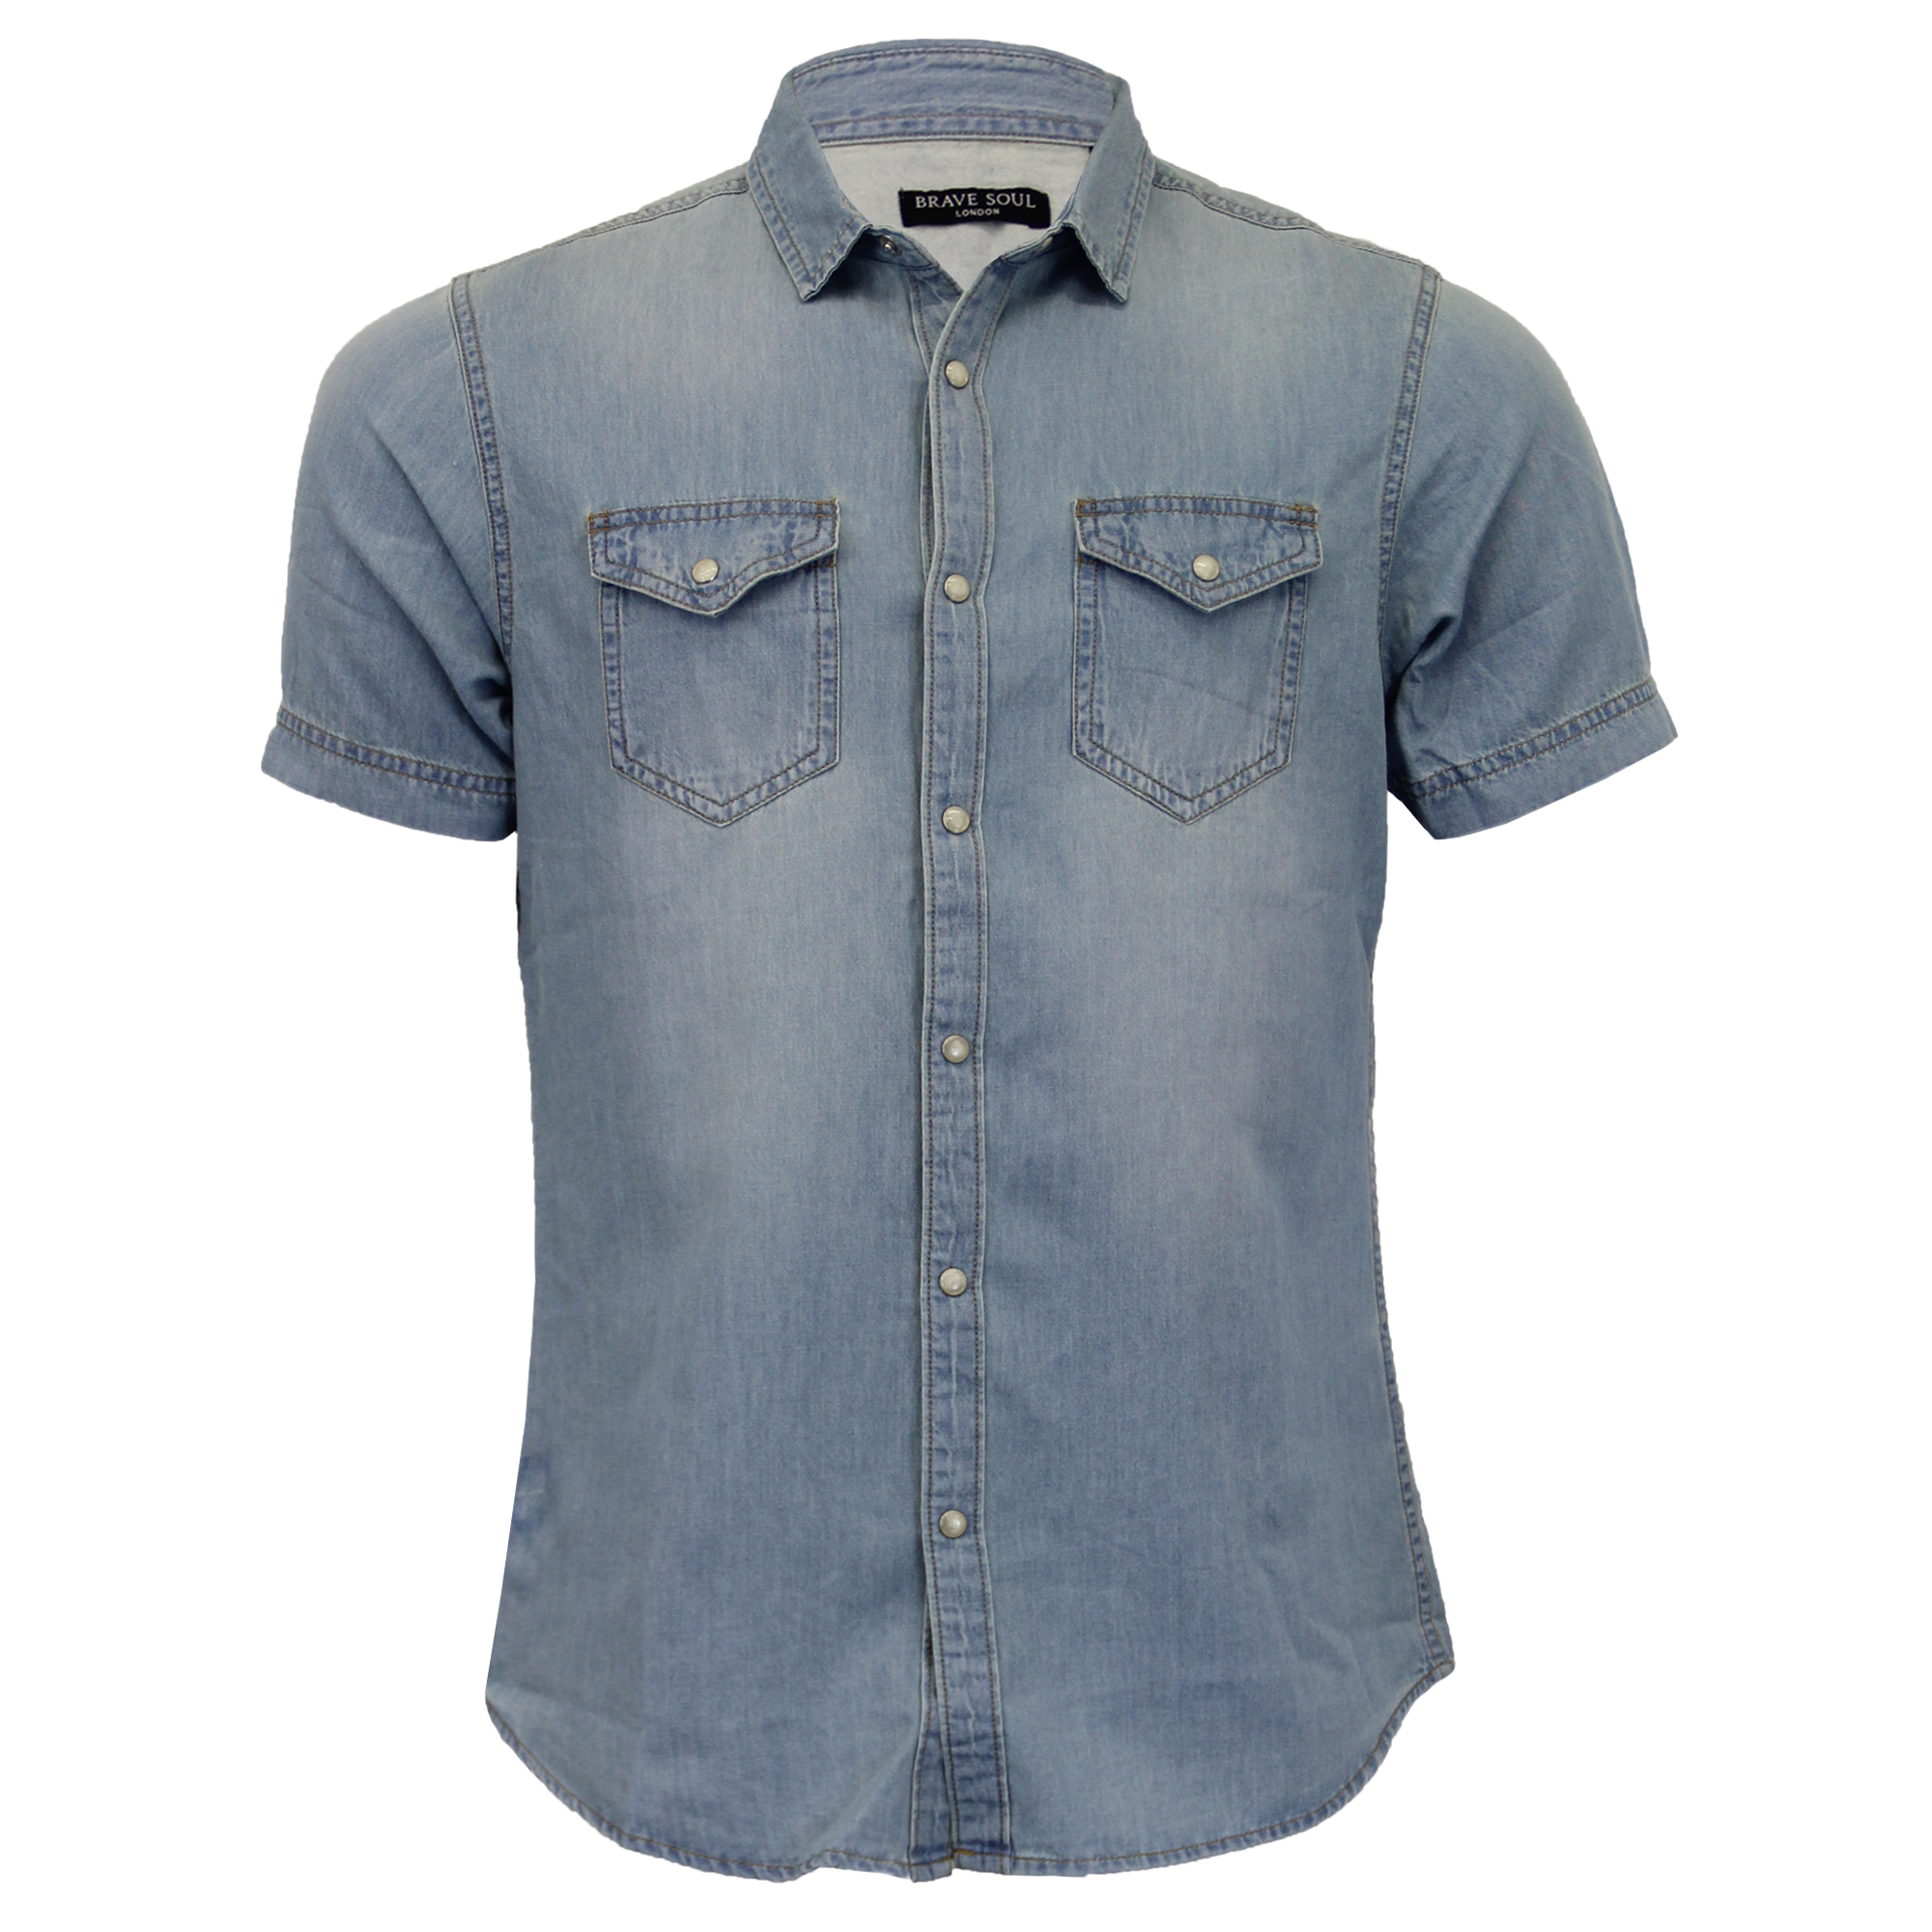 Mens-Denim-Vintage-Shirt-Brave-Soul-039-Amor-039-Short-Sleeved-Faded-Cotton-Summer thumbnail 3